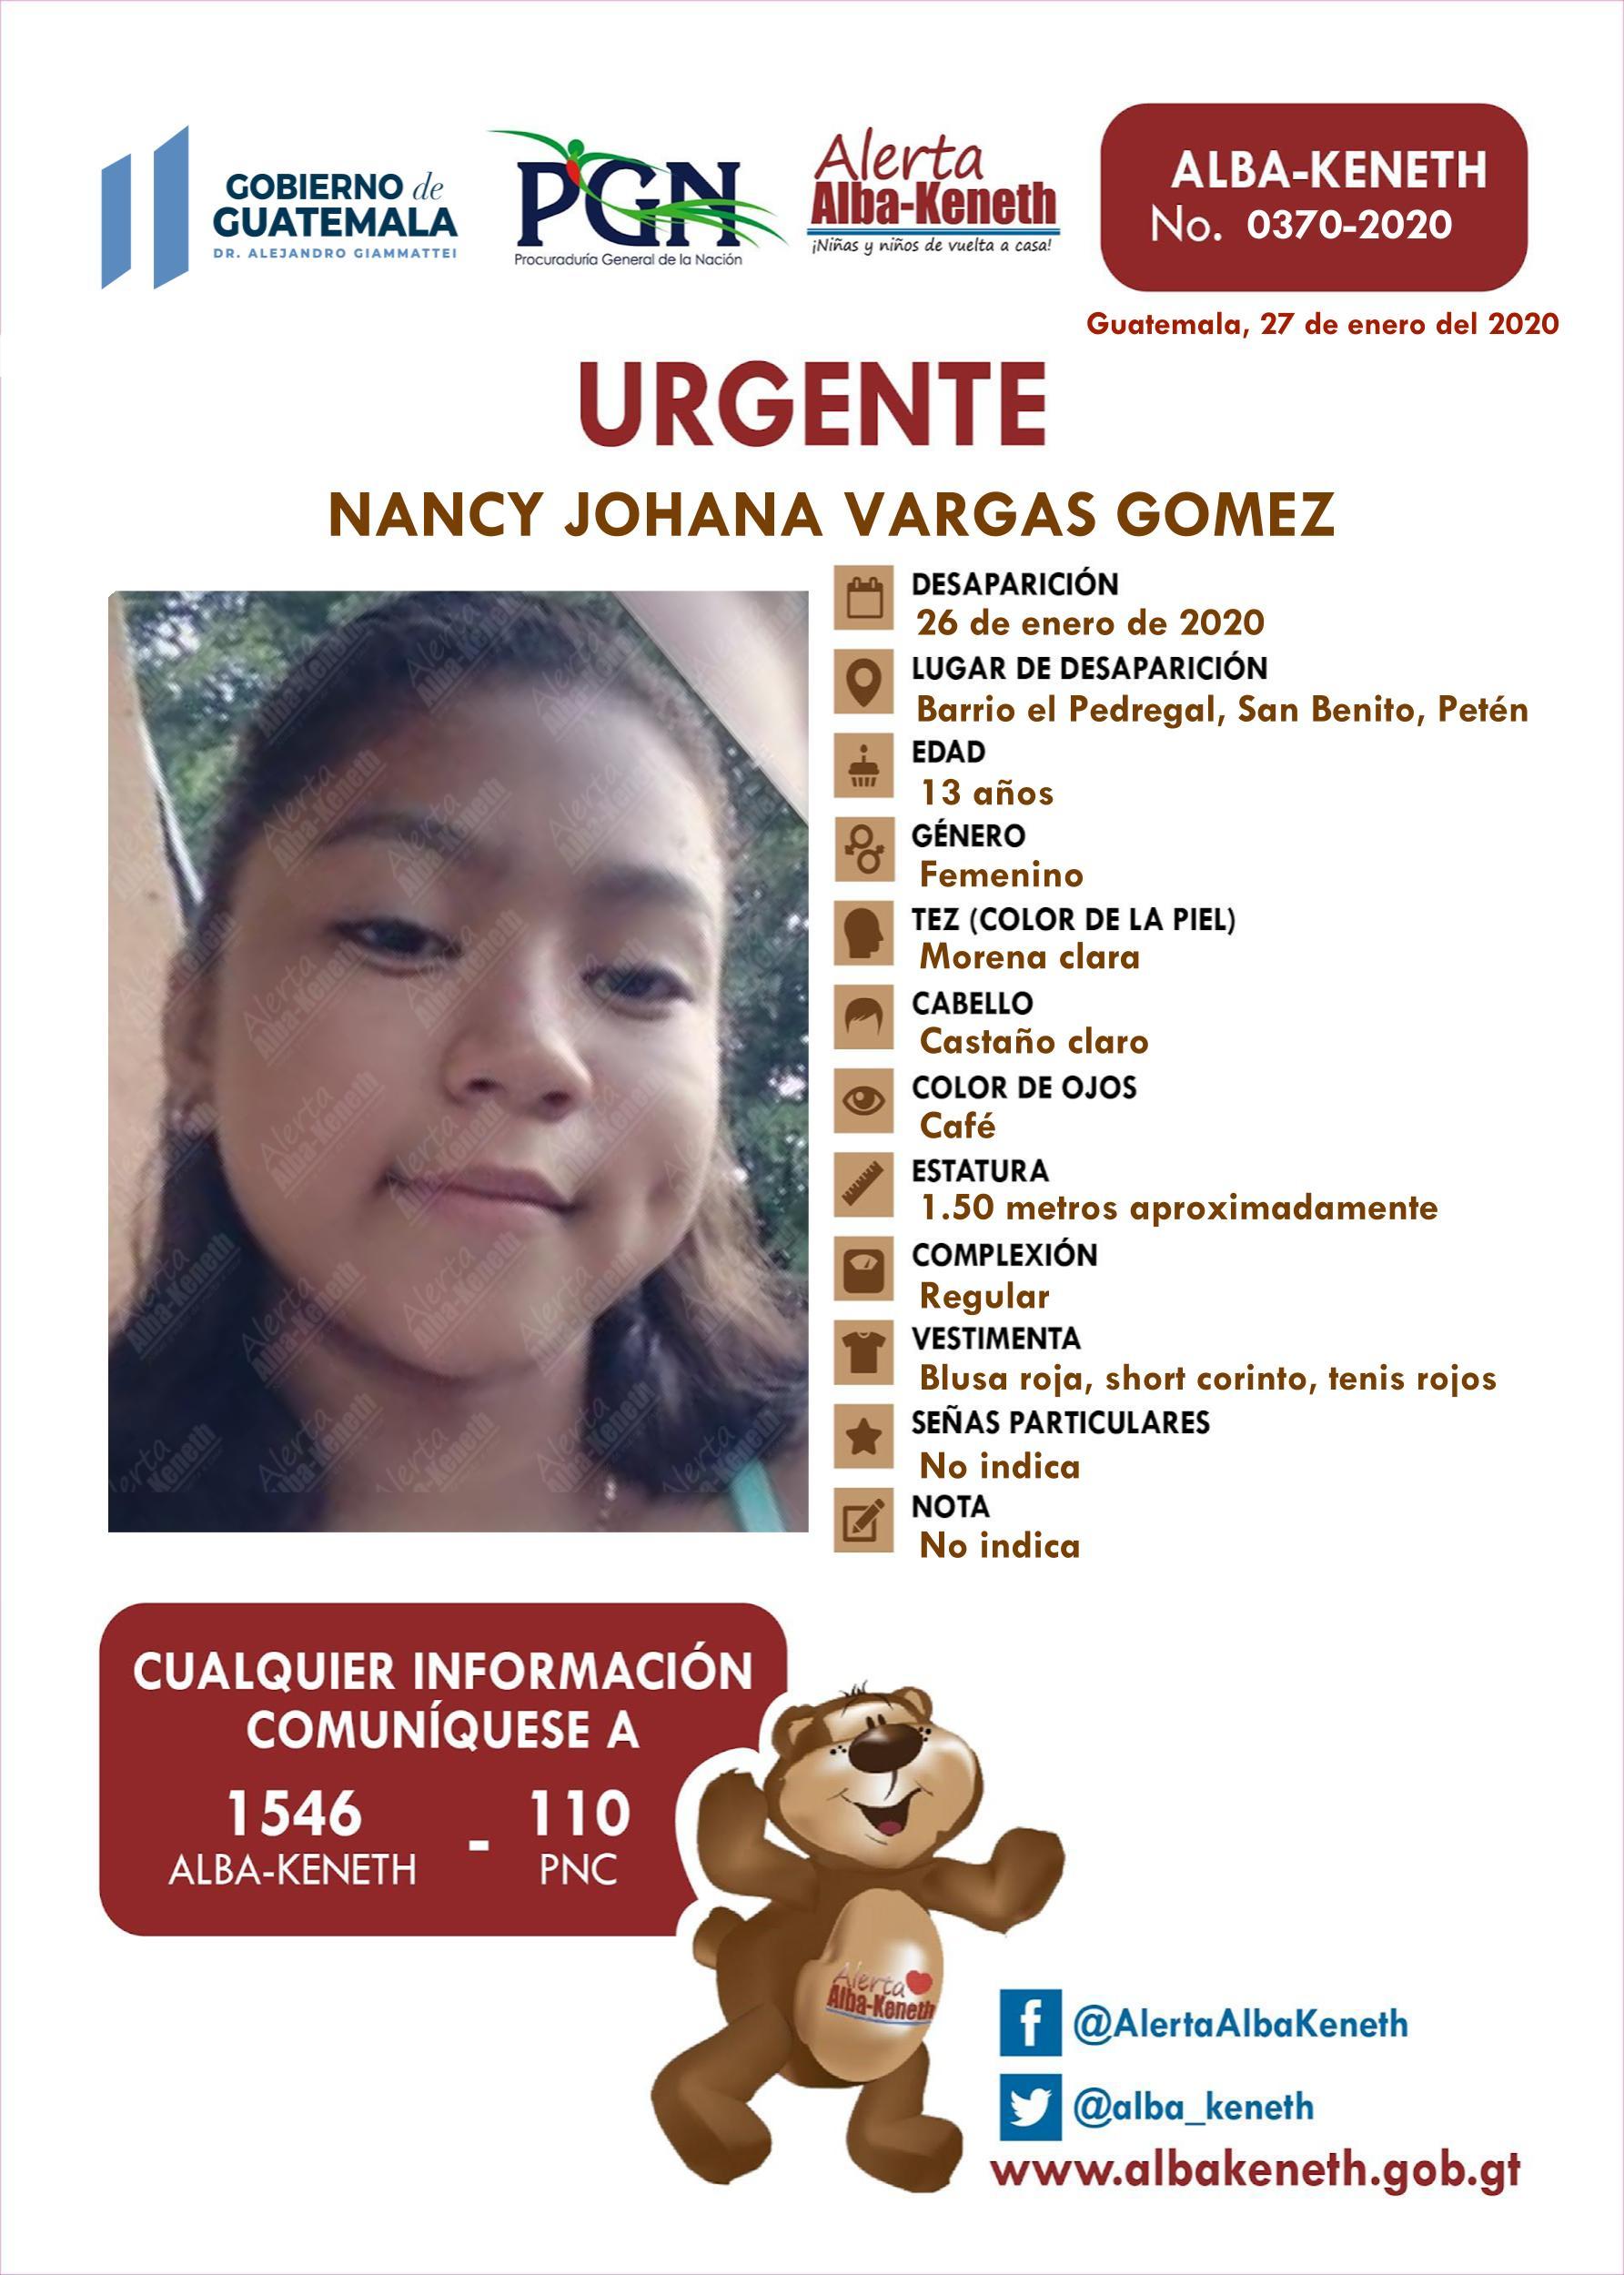 Nancy Johana Vargas Gomez